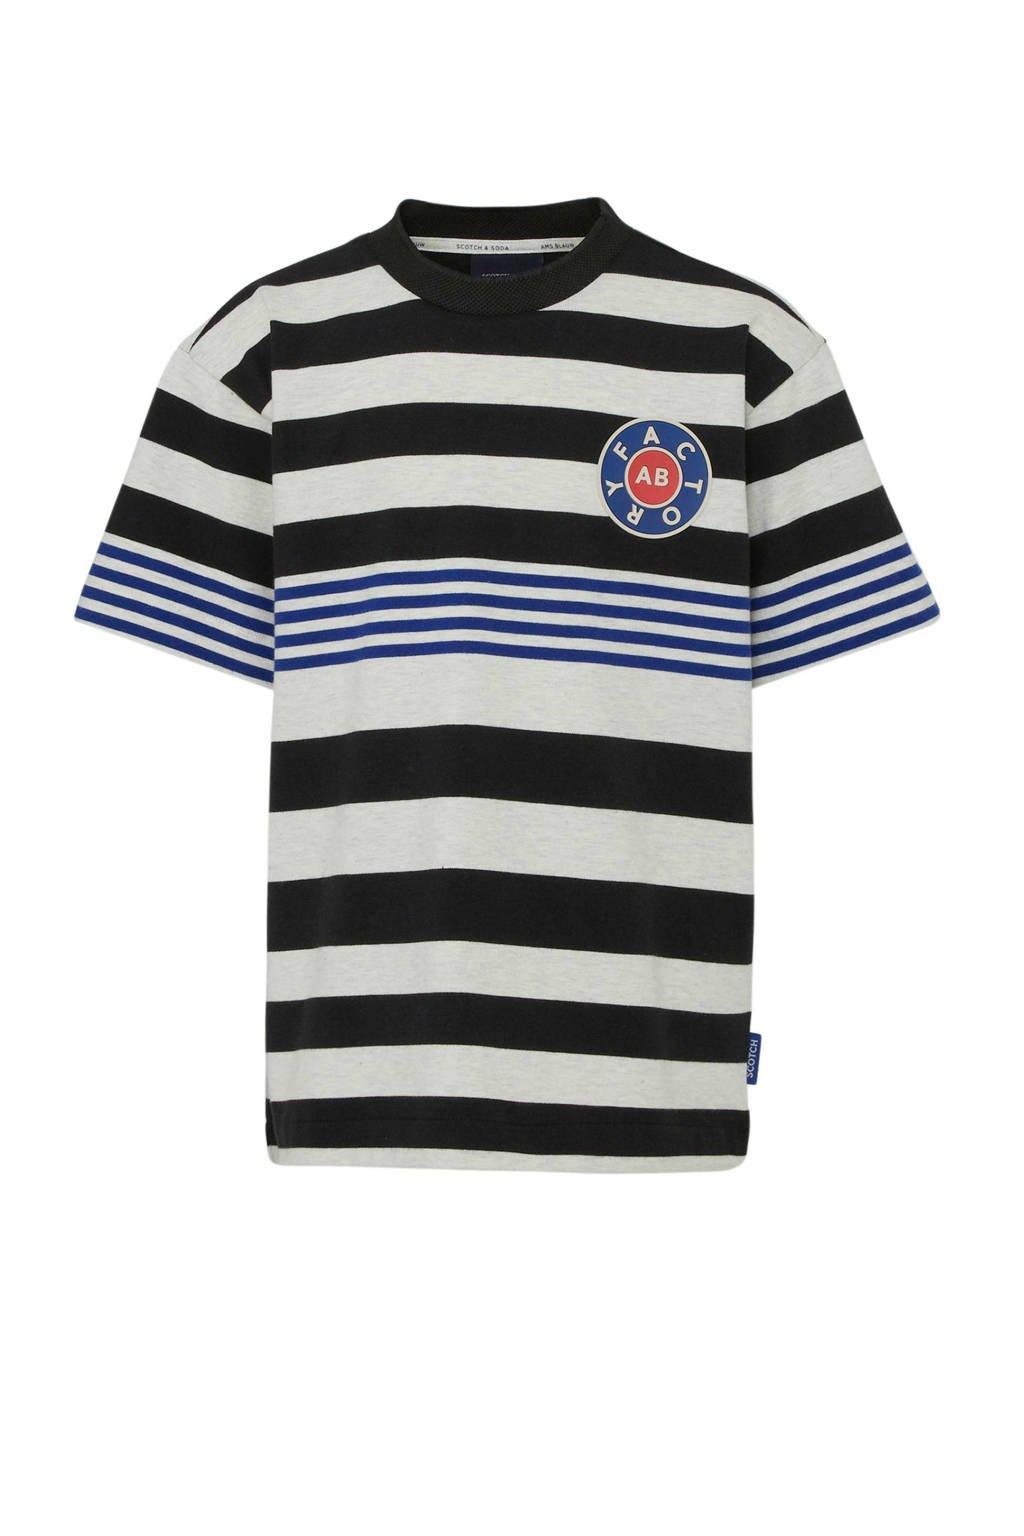 Scotch & Soda Amsterdams Blauw gestreept T-shirt ecru/donkerblauw/zwart, Ecru/donkerblauw/zwart